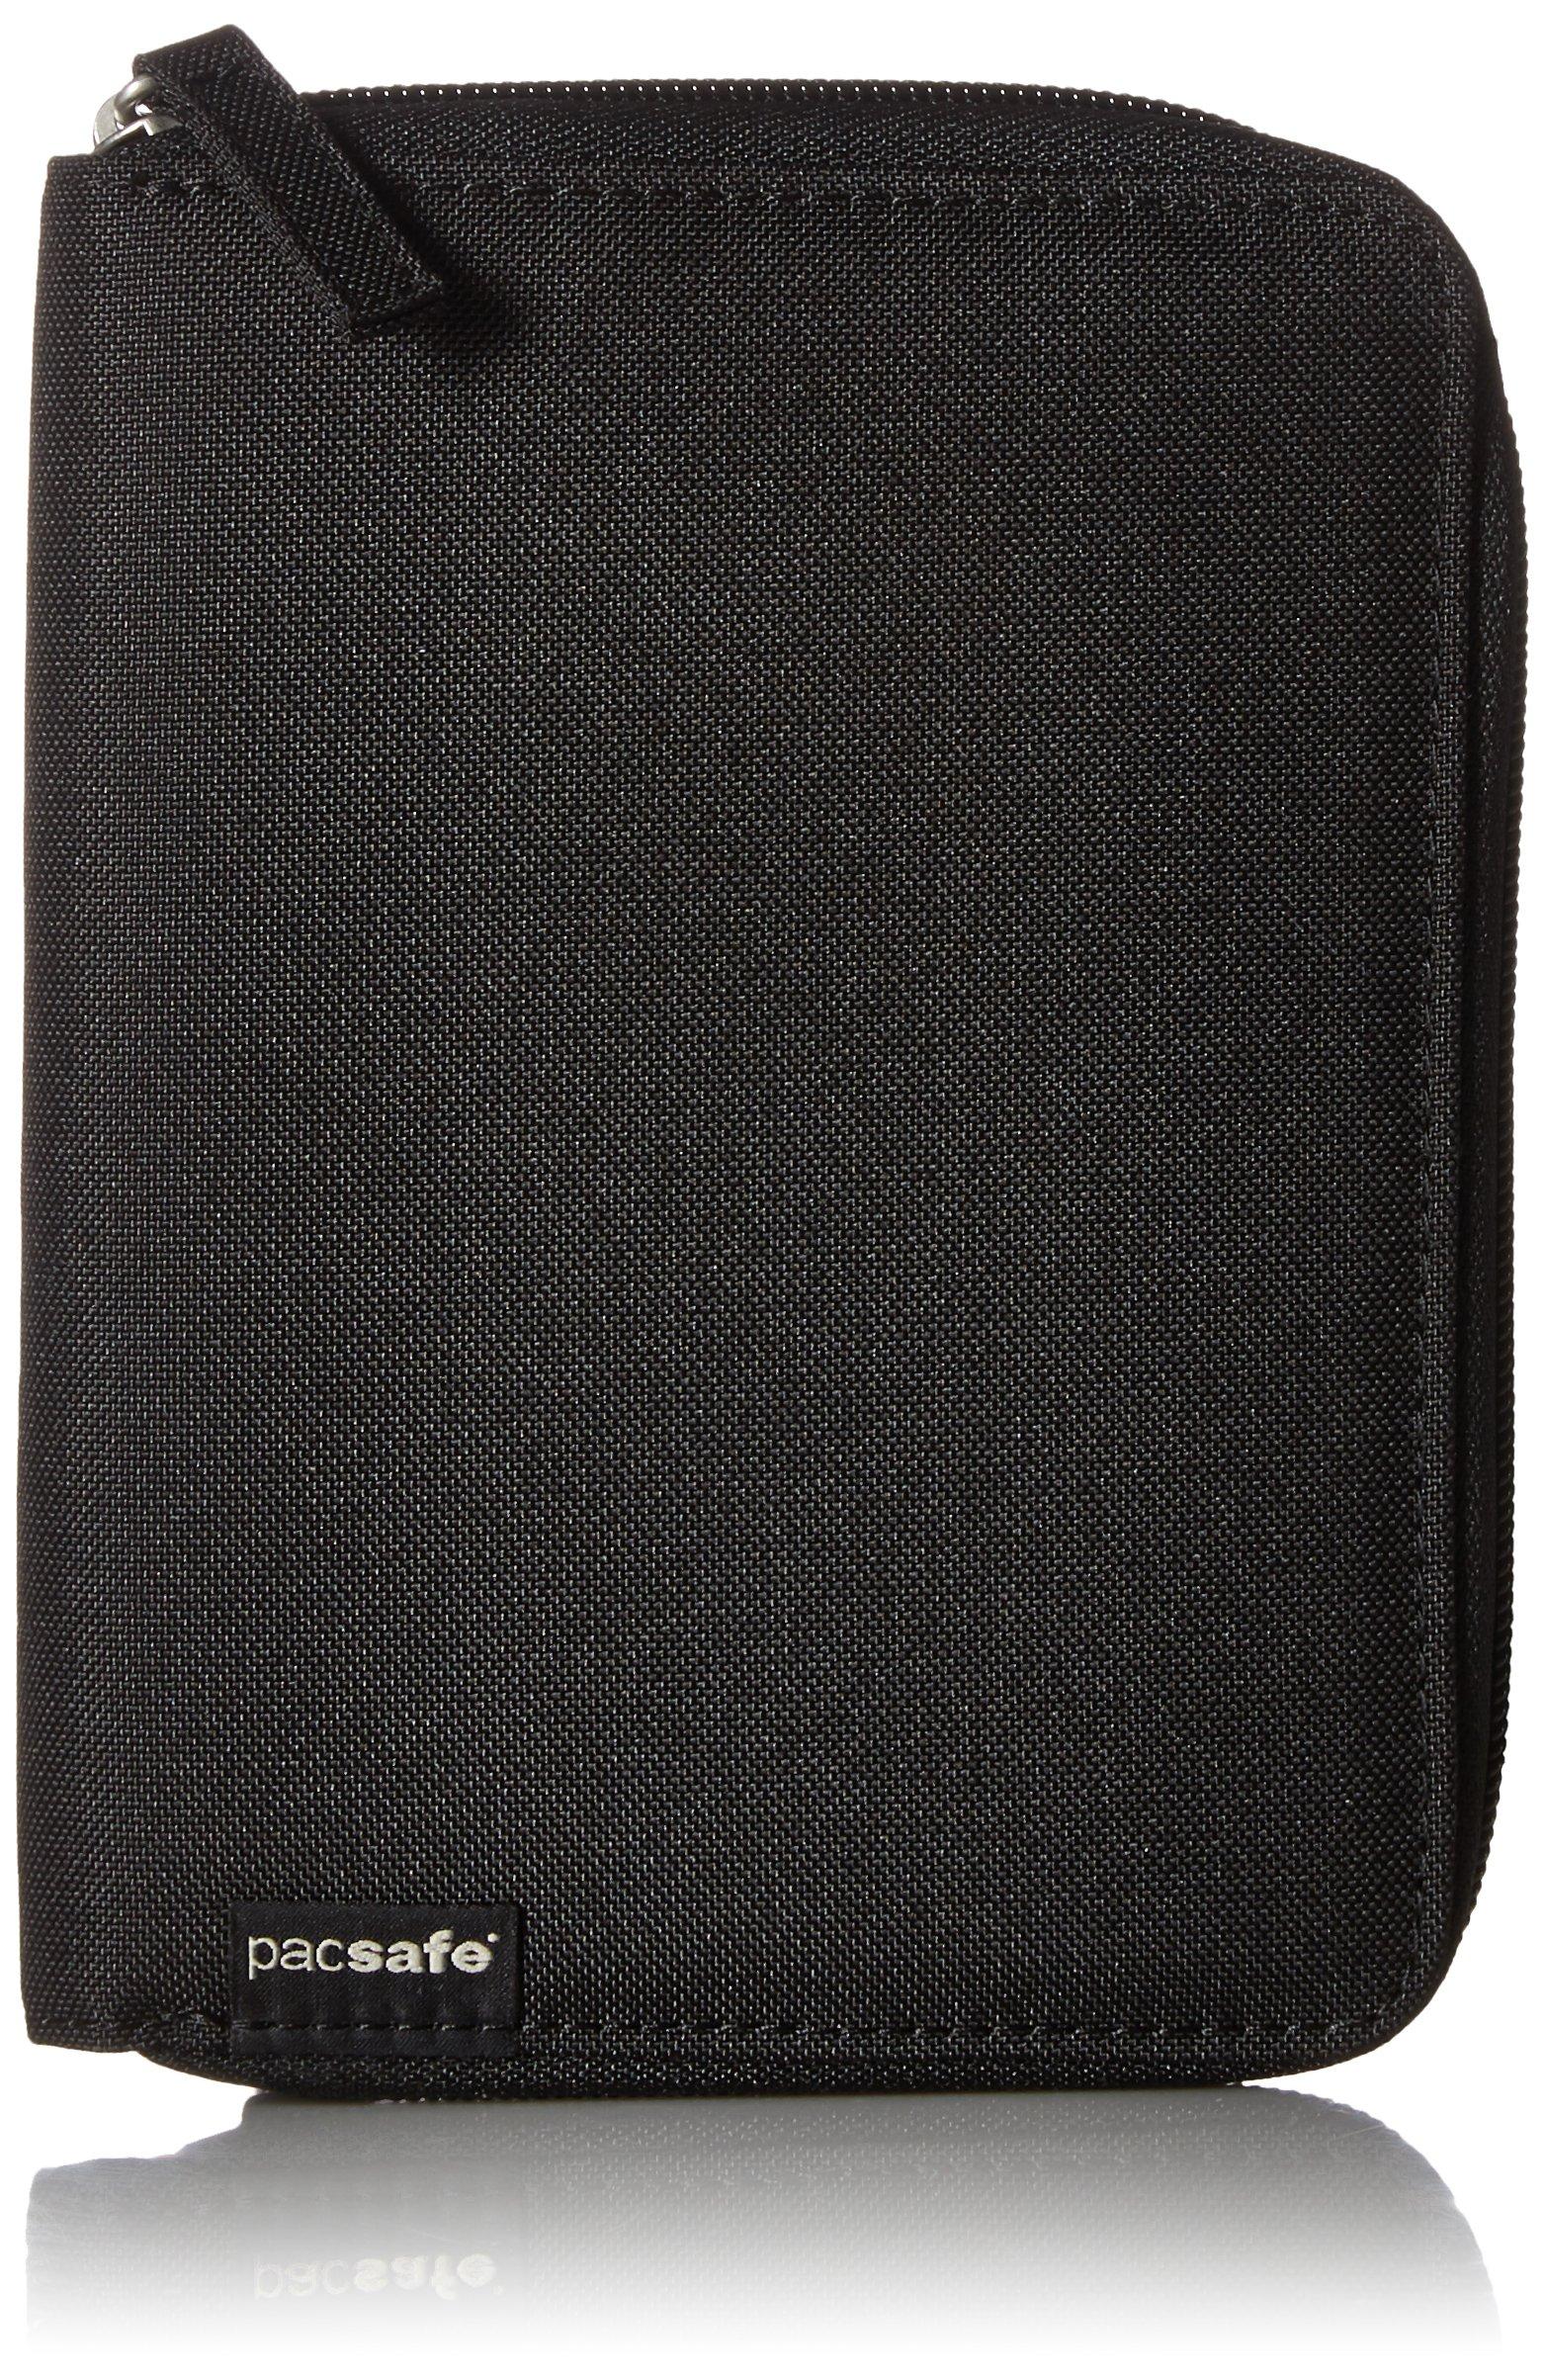 Pacsafe RFIDsafe LX150 Anti-Theft RFID Blocking Passport Wallet, Black by Pacsafe